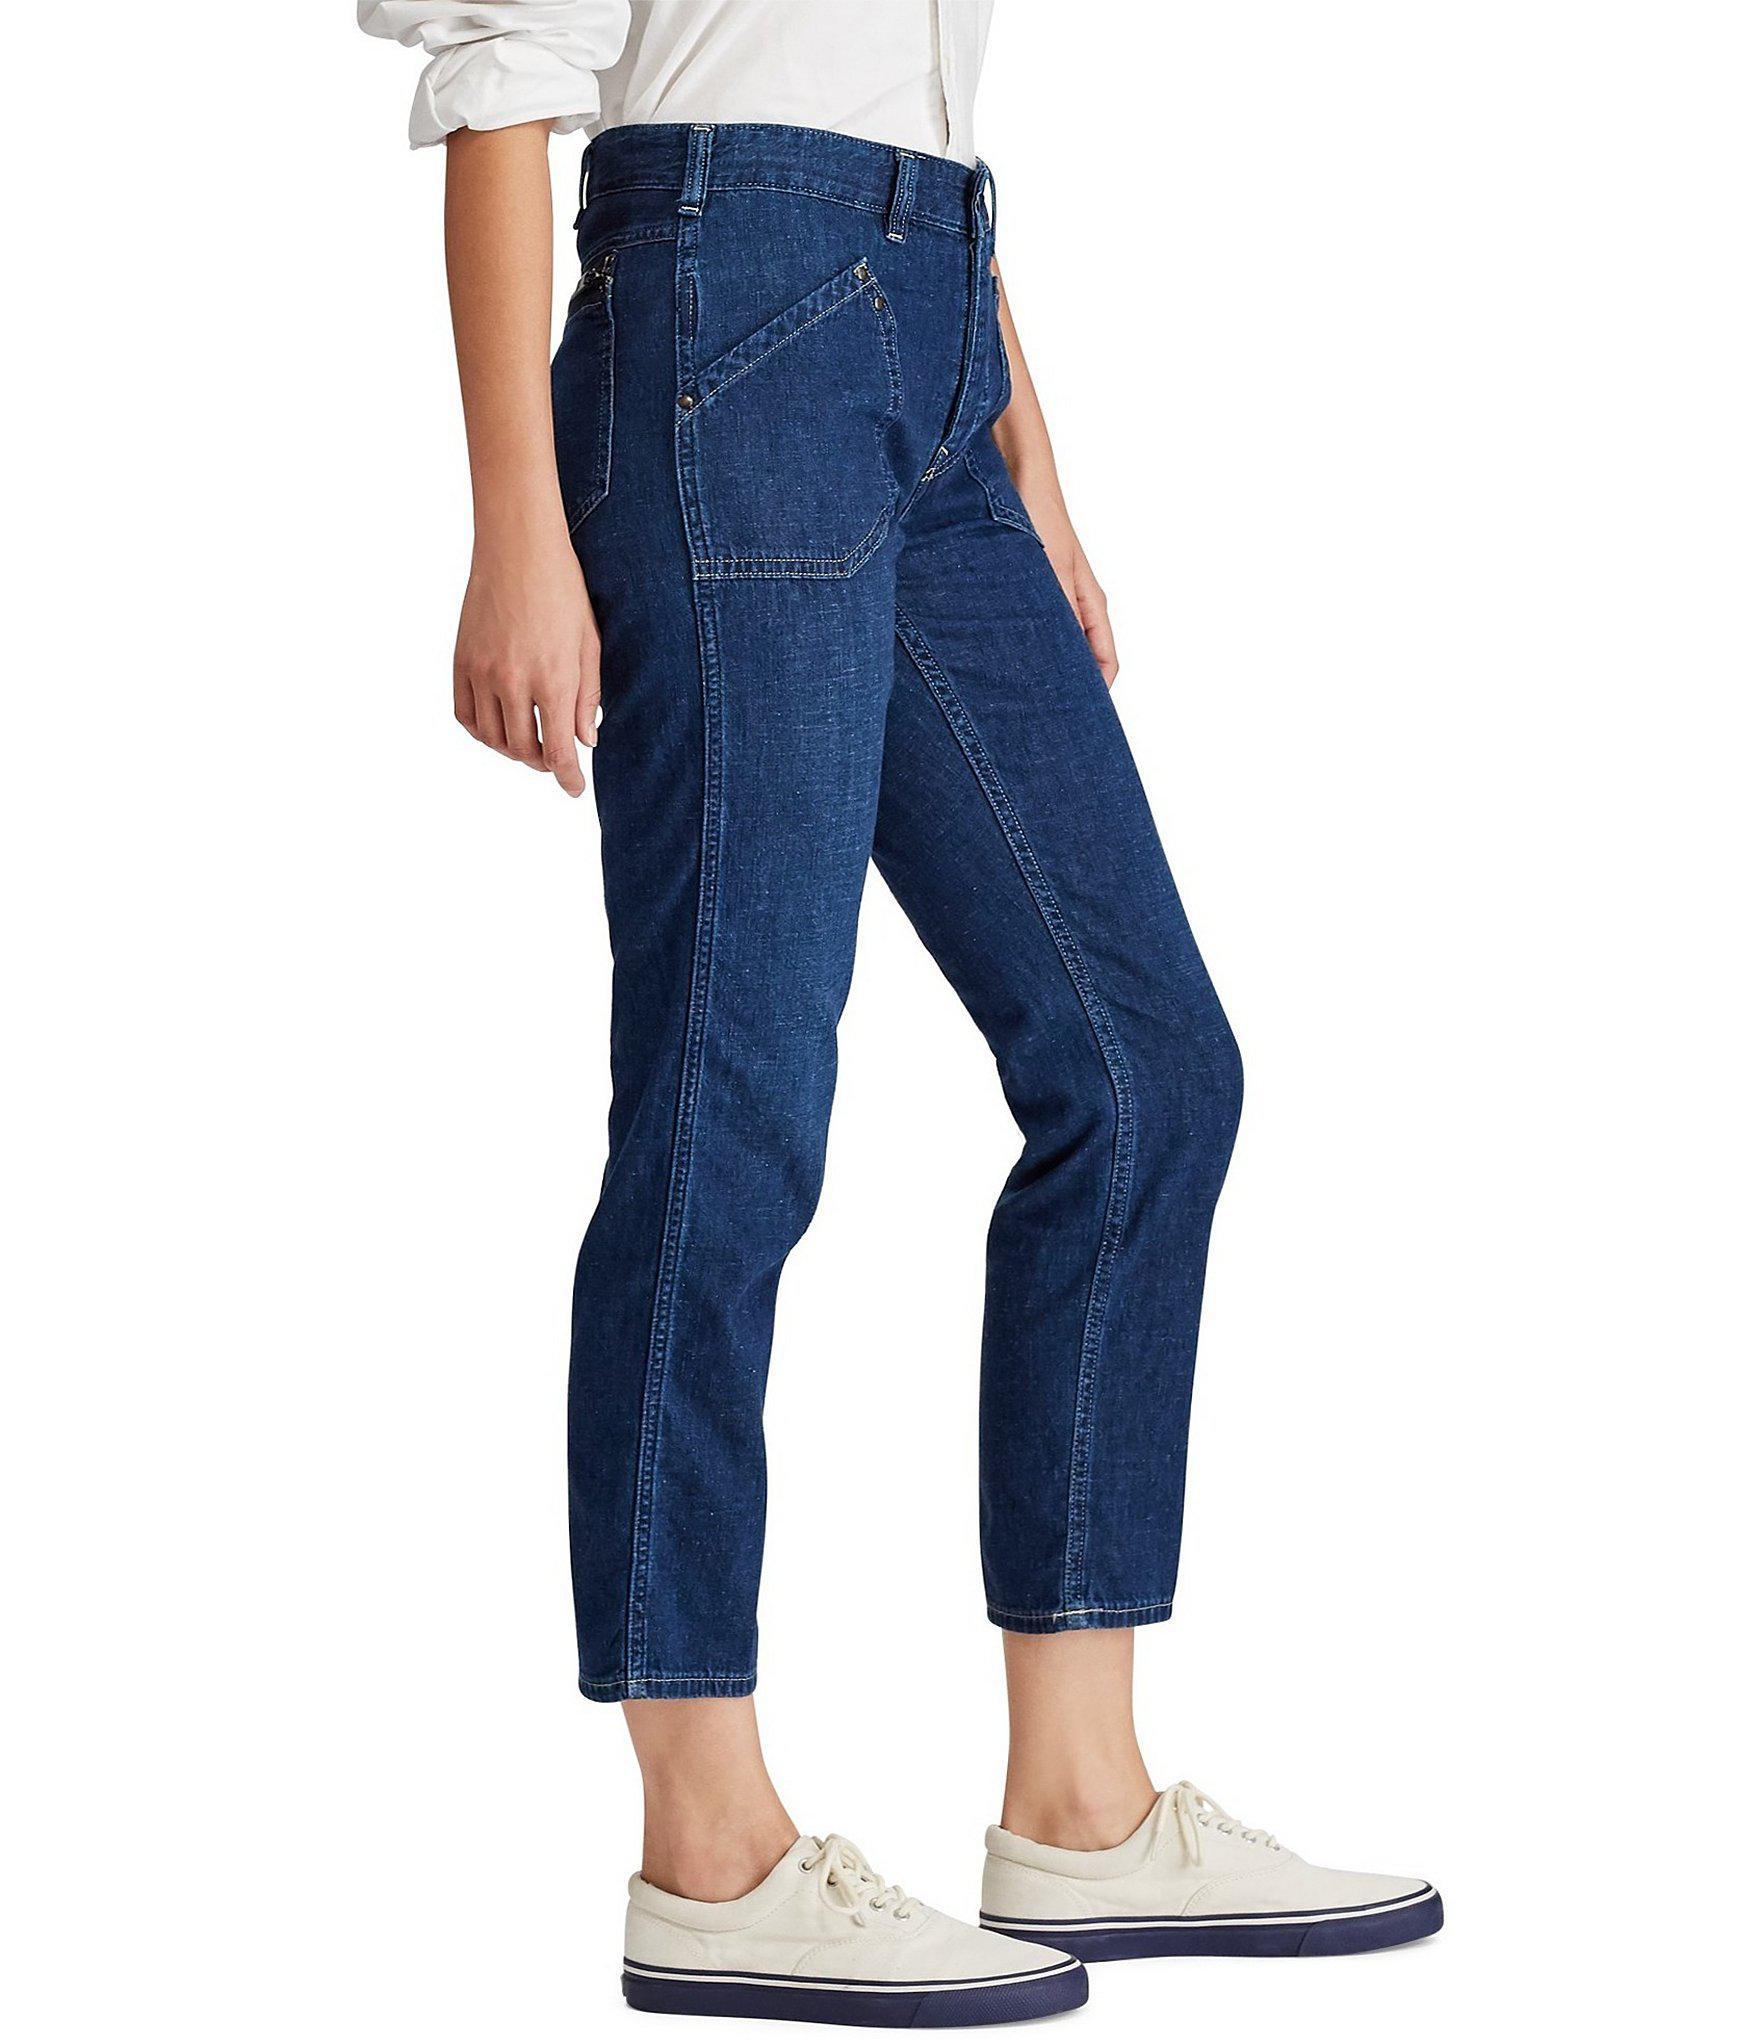 cc91ace3b Polo Ralph Lauren - Blue Workwear Denim Skinny Jeans - Lyst. View fullscreen